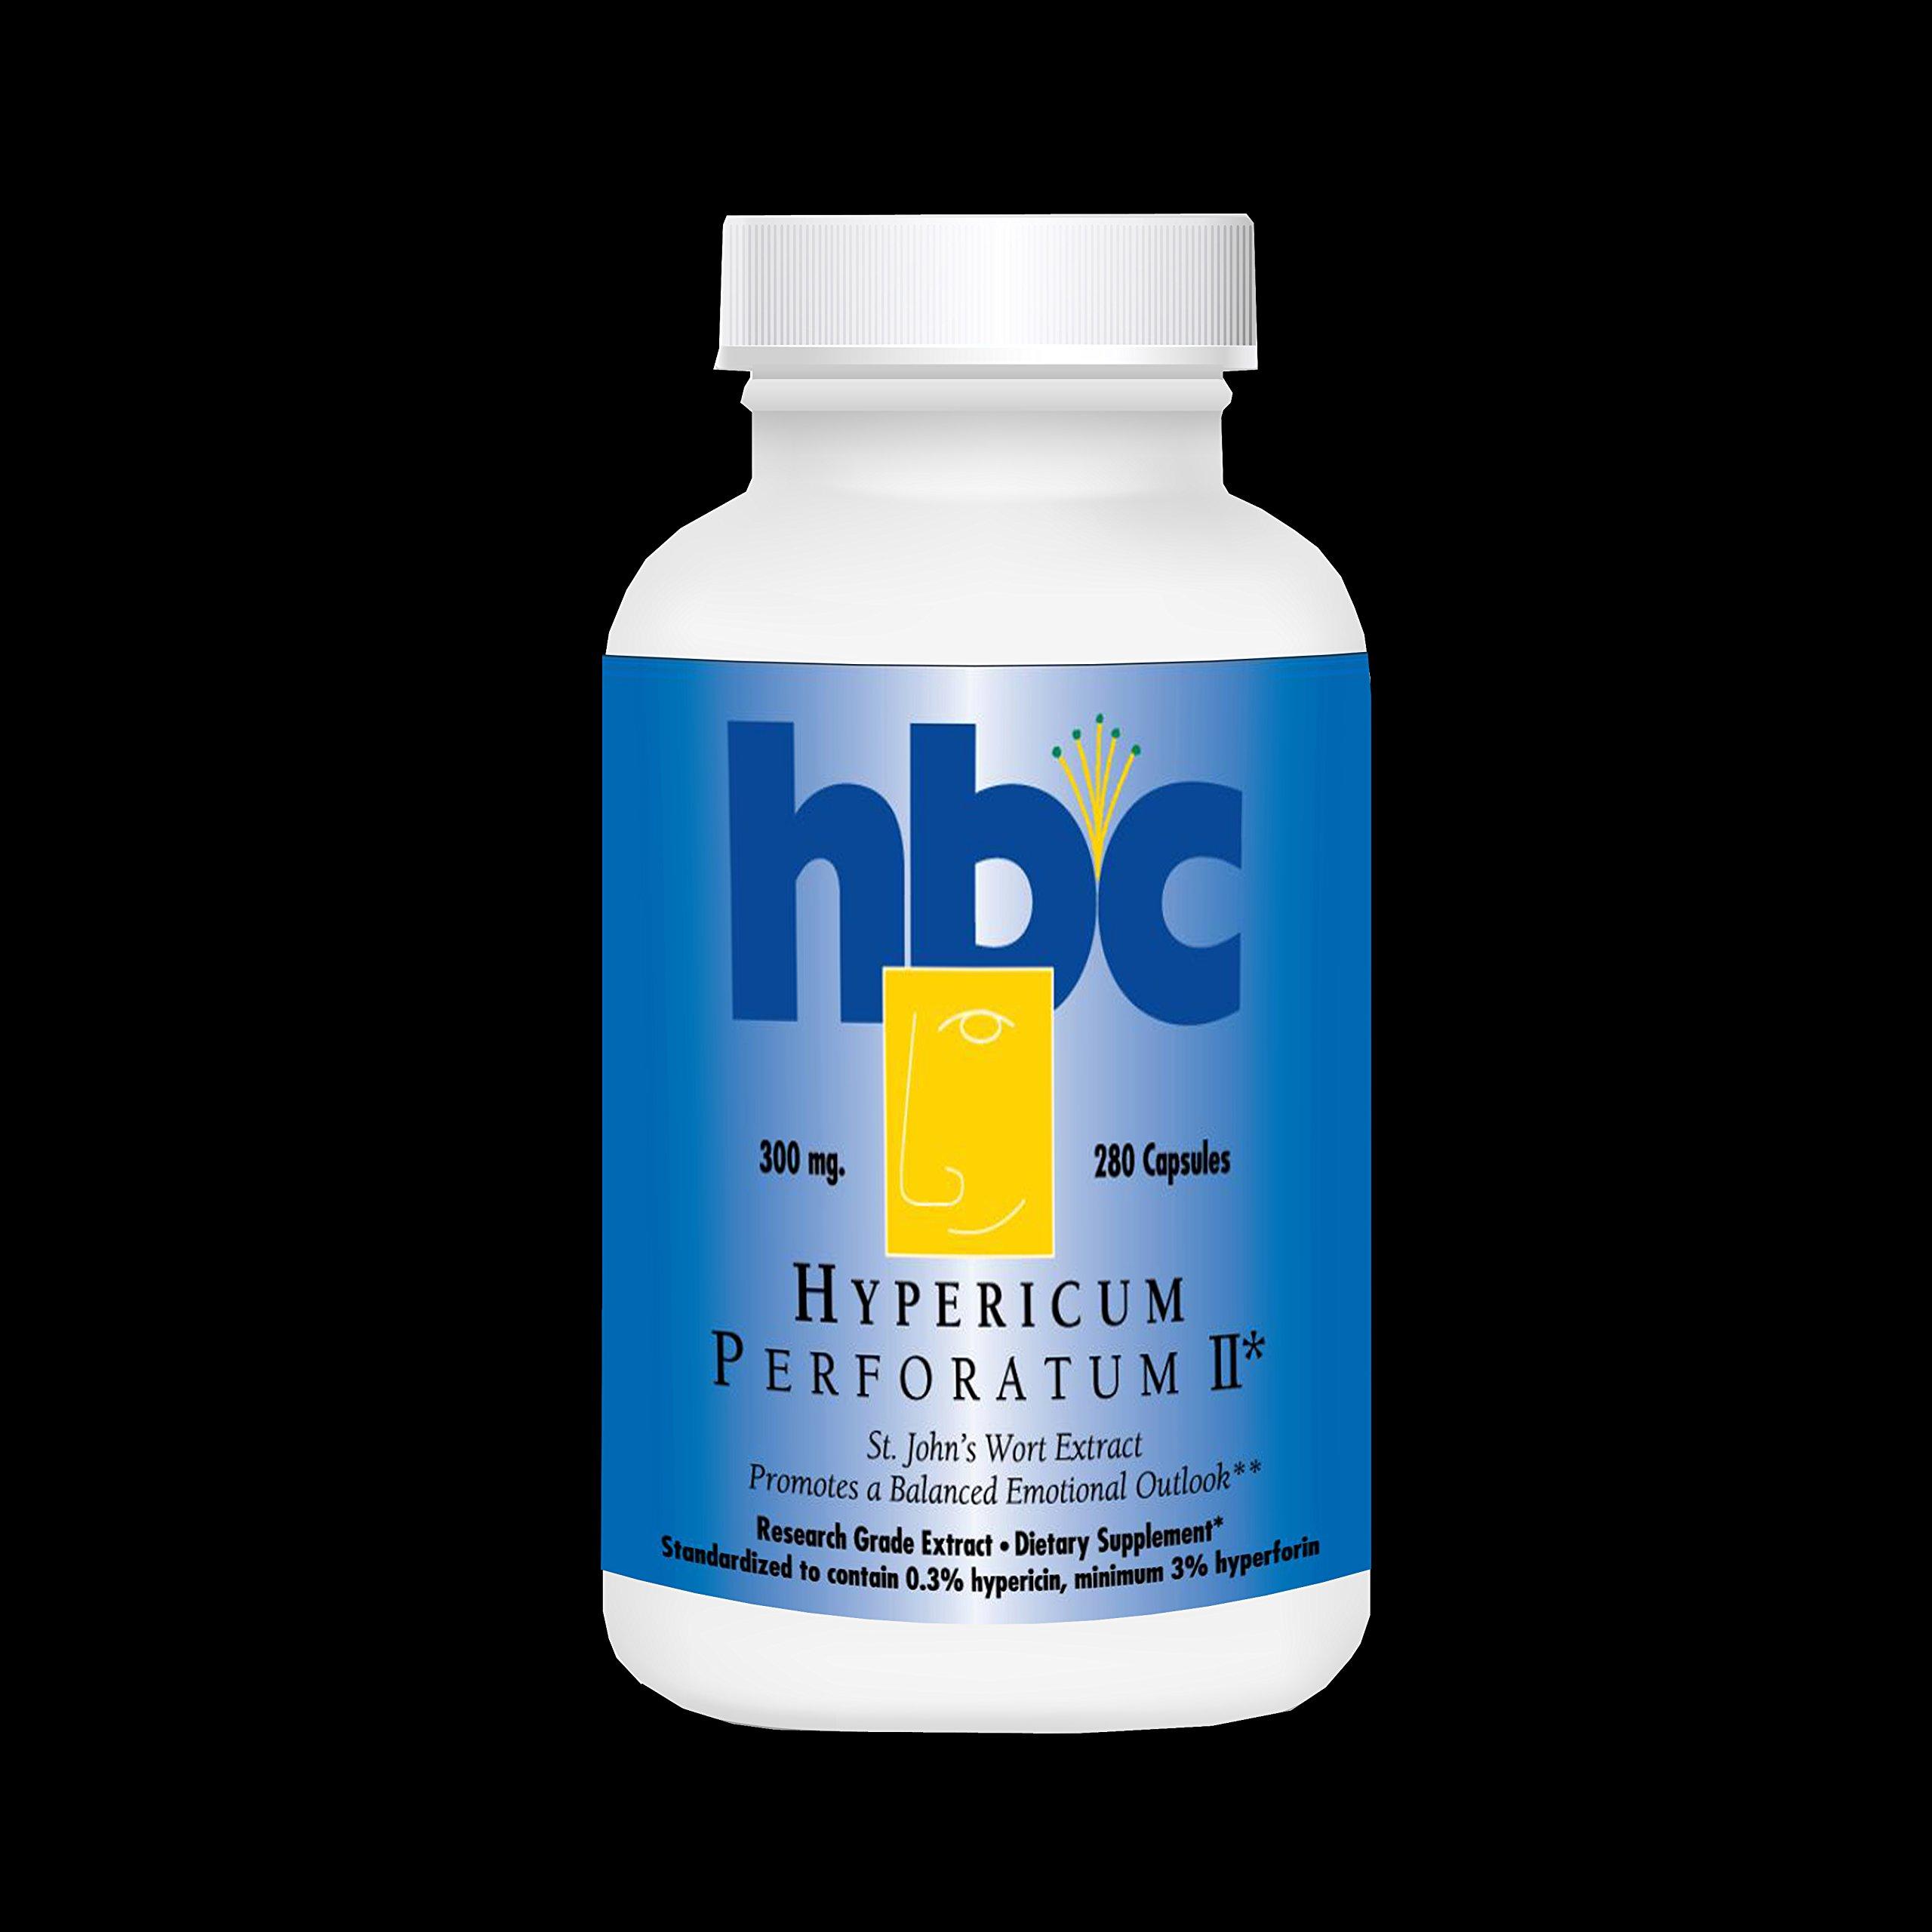 Hypericum Perforatum II - 280 Tablets! 11 Cents a Tablet! Continuity Saver Plan